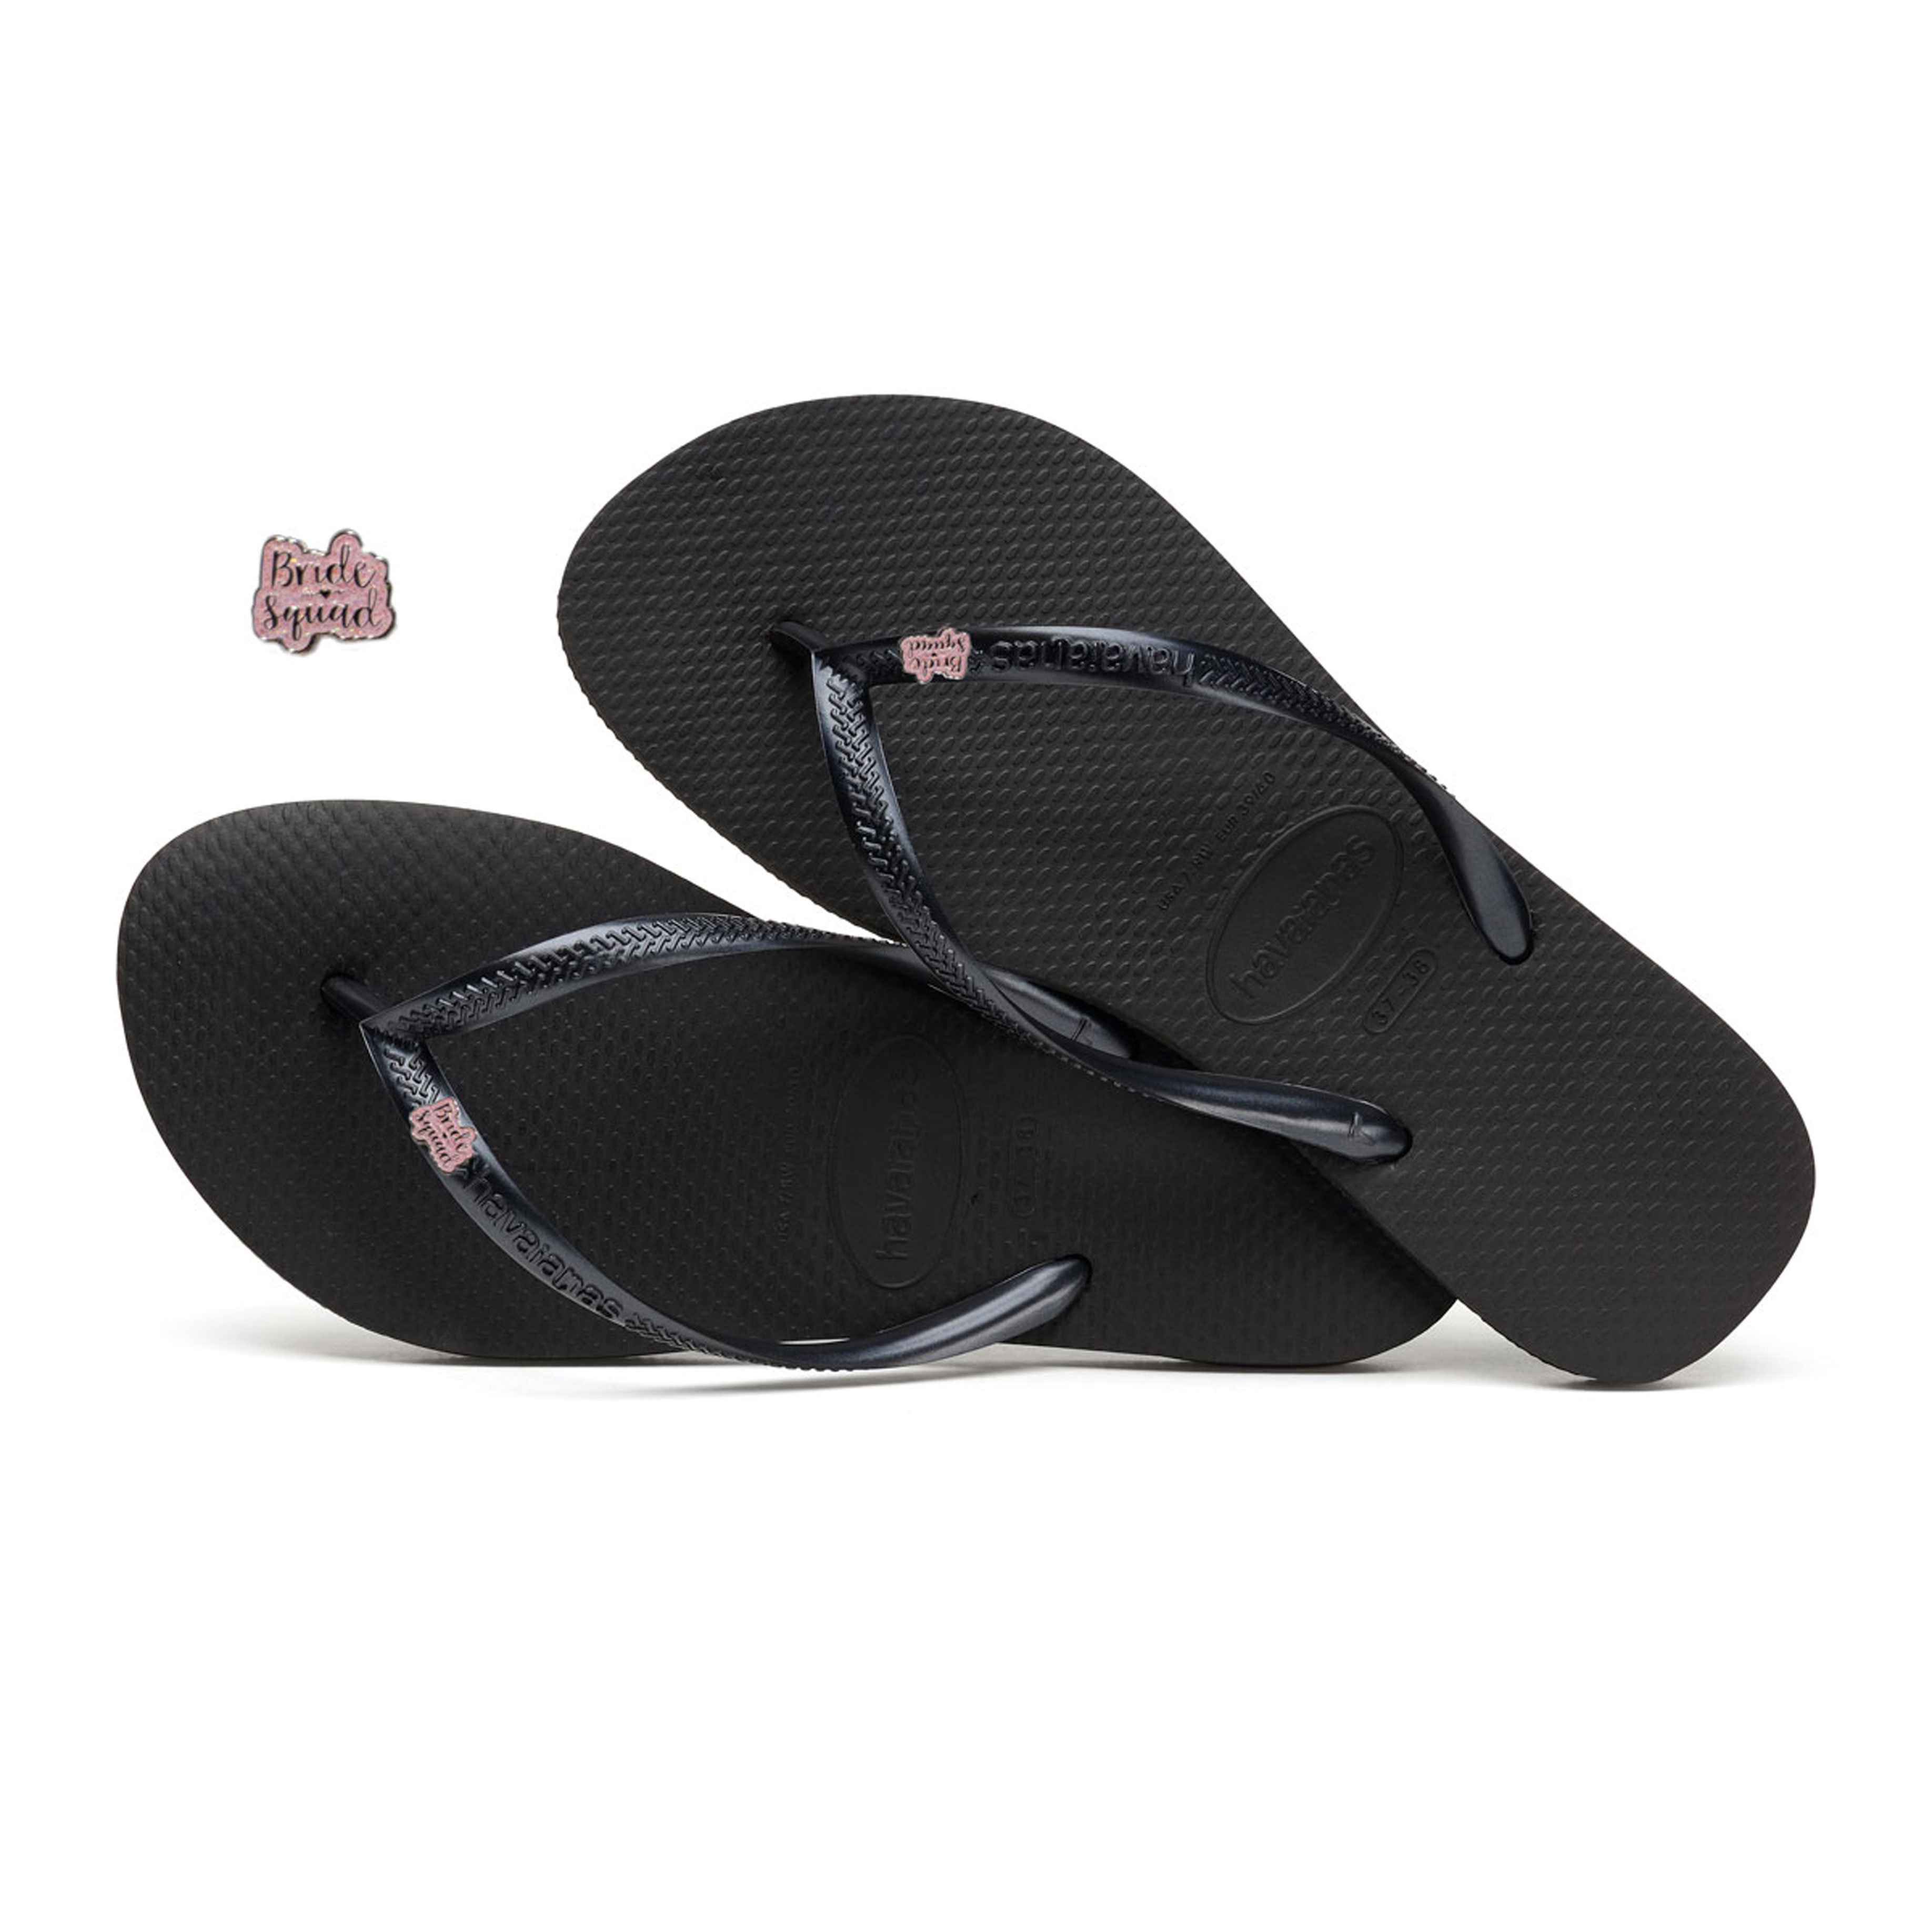 Havaianas Black Slim Flip Flops with Pink Glitter Bride Squad Charm